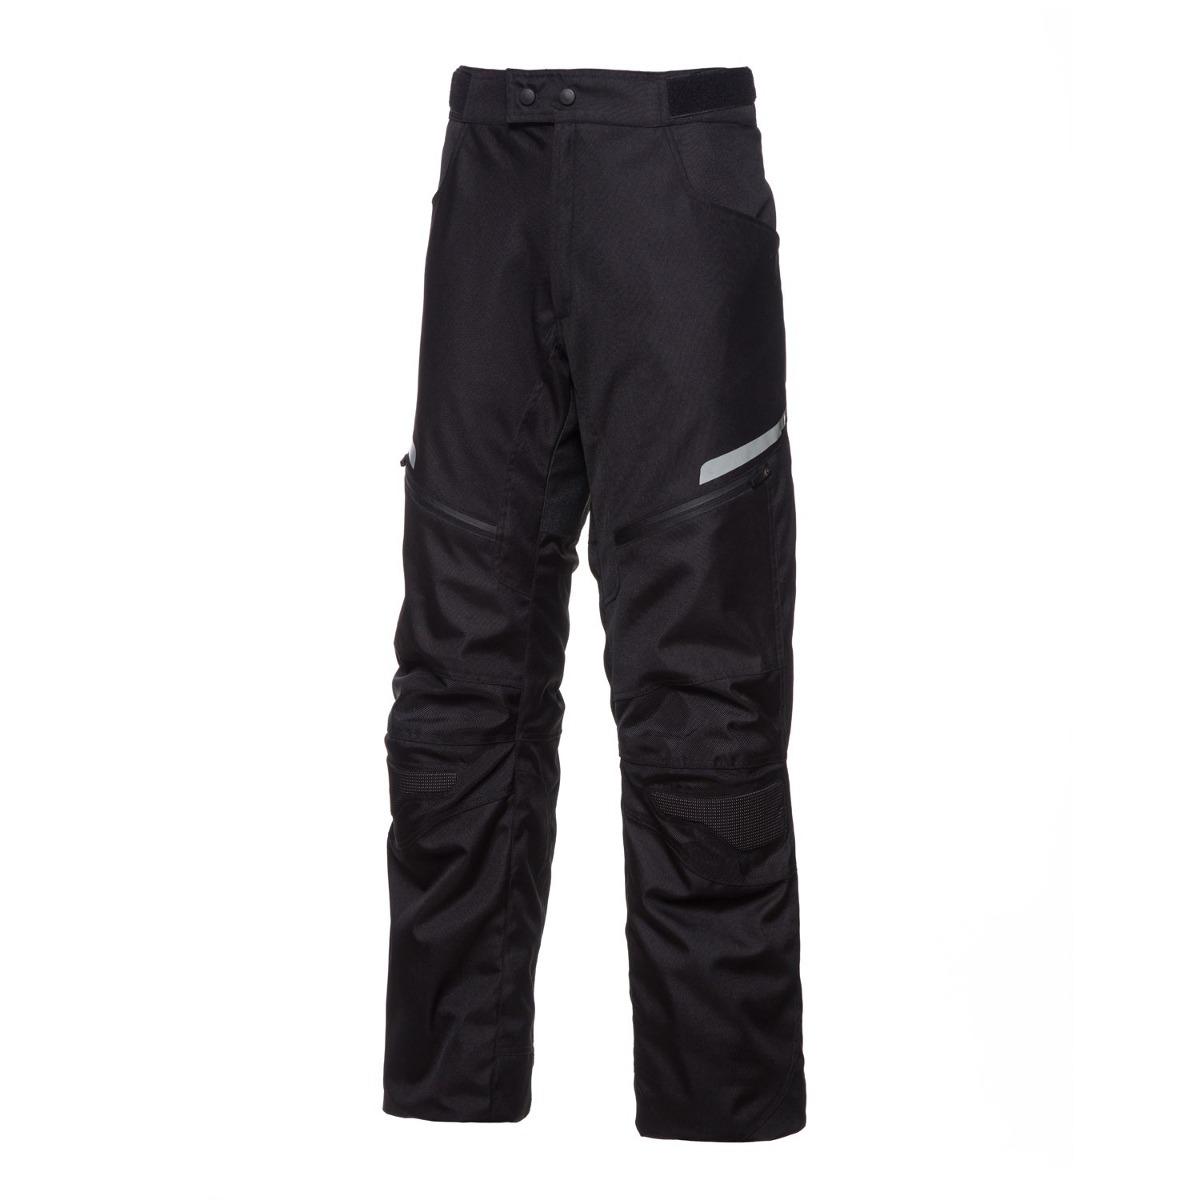 pantalon cordura fuse nineTOone by ls2 negro talle xl